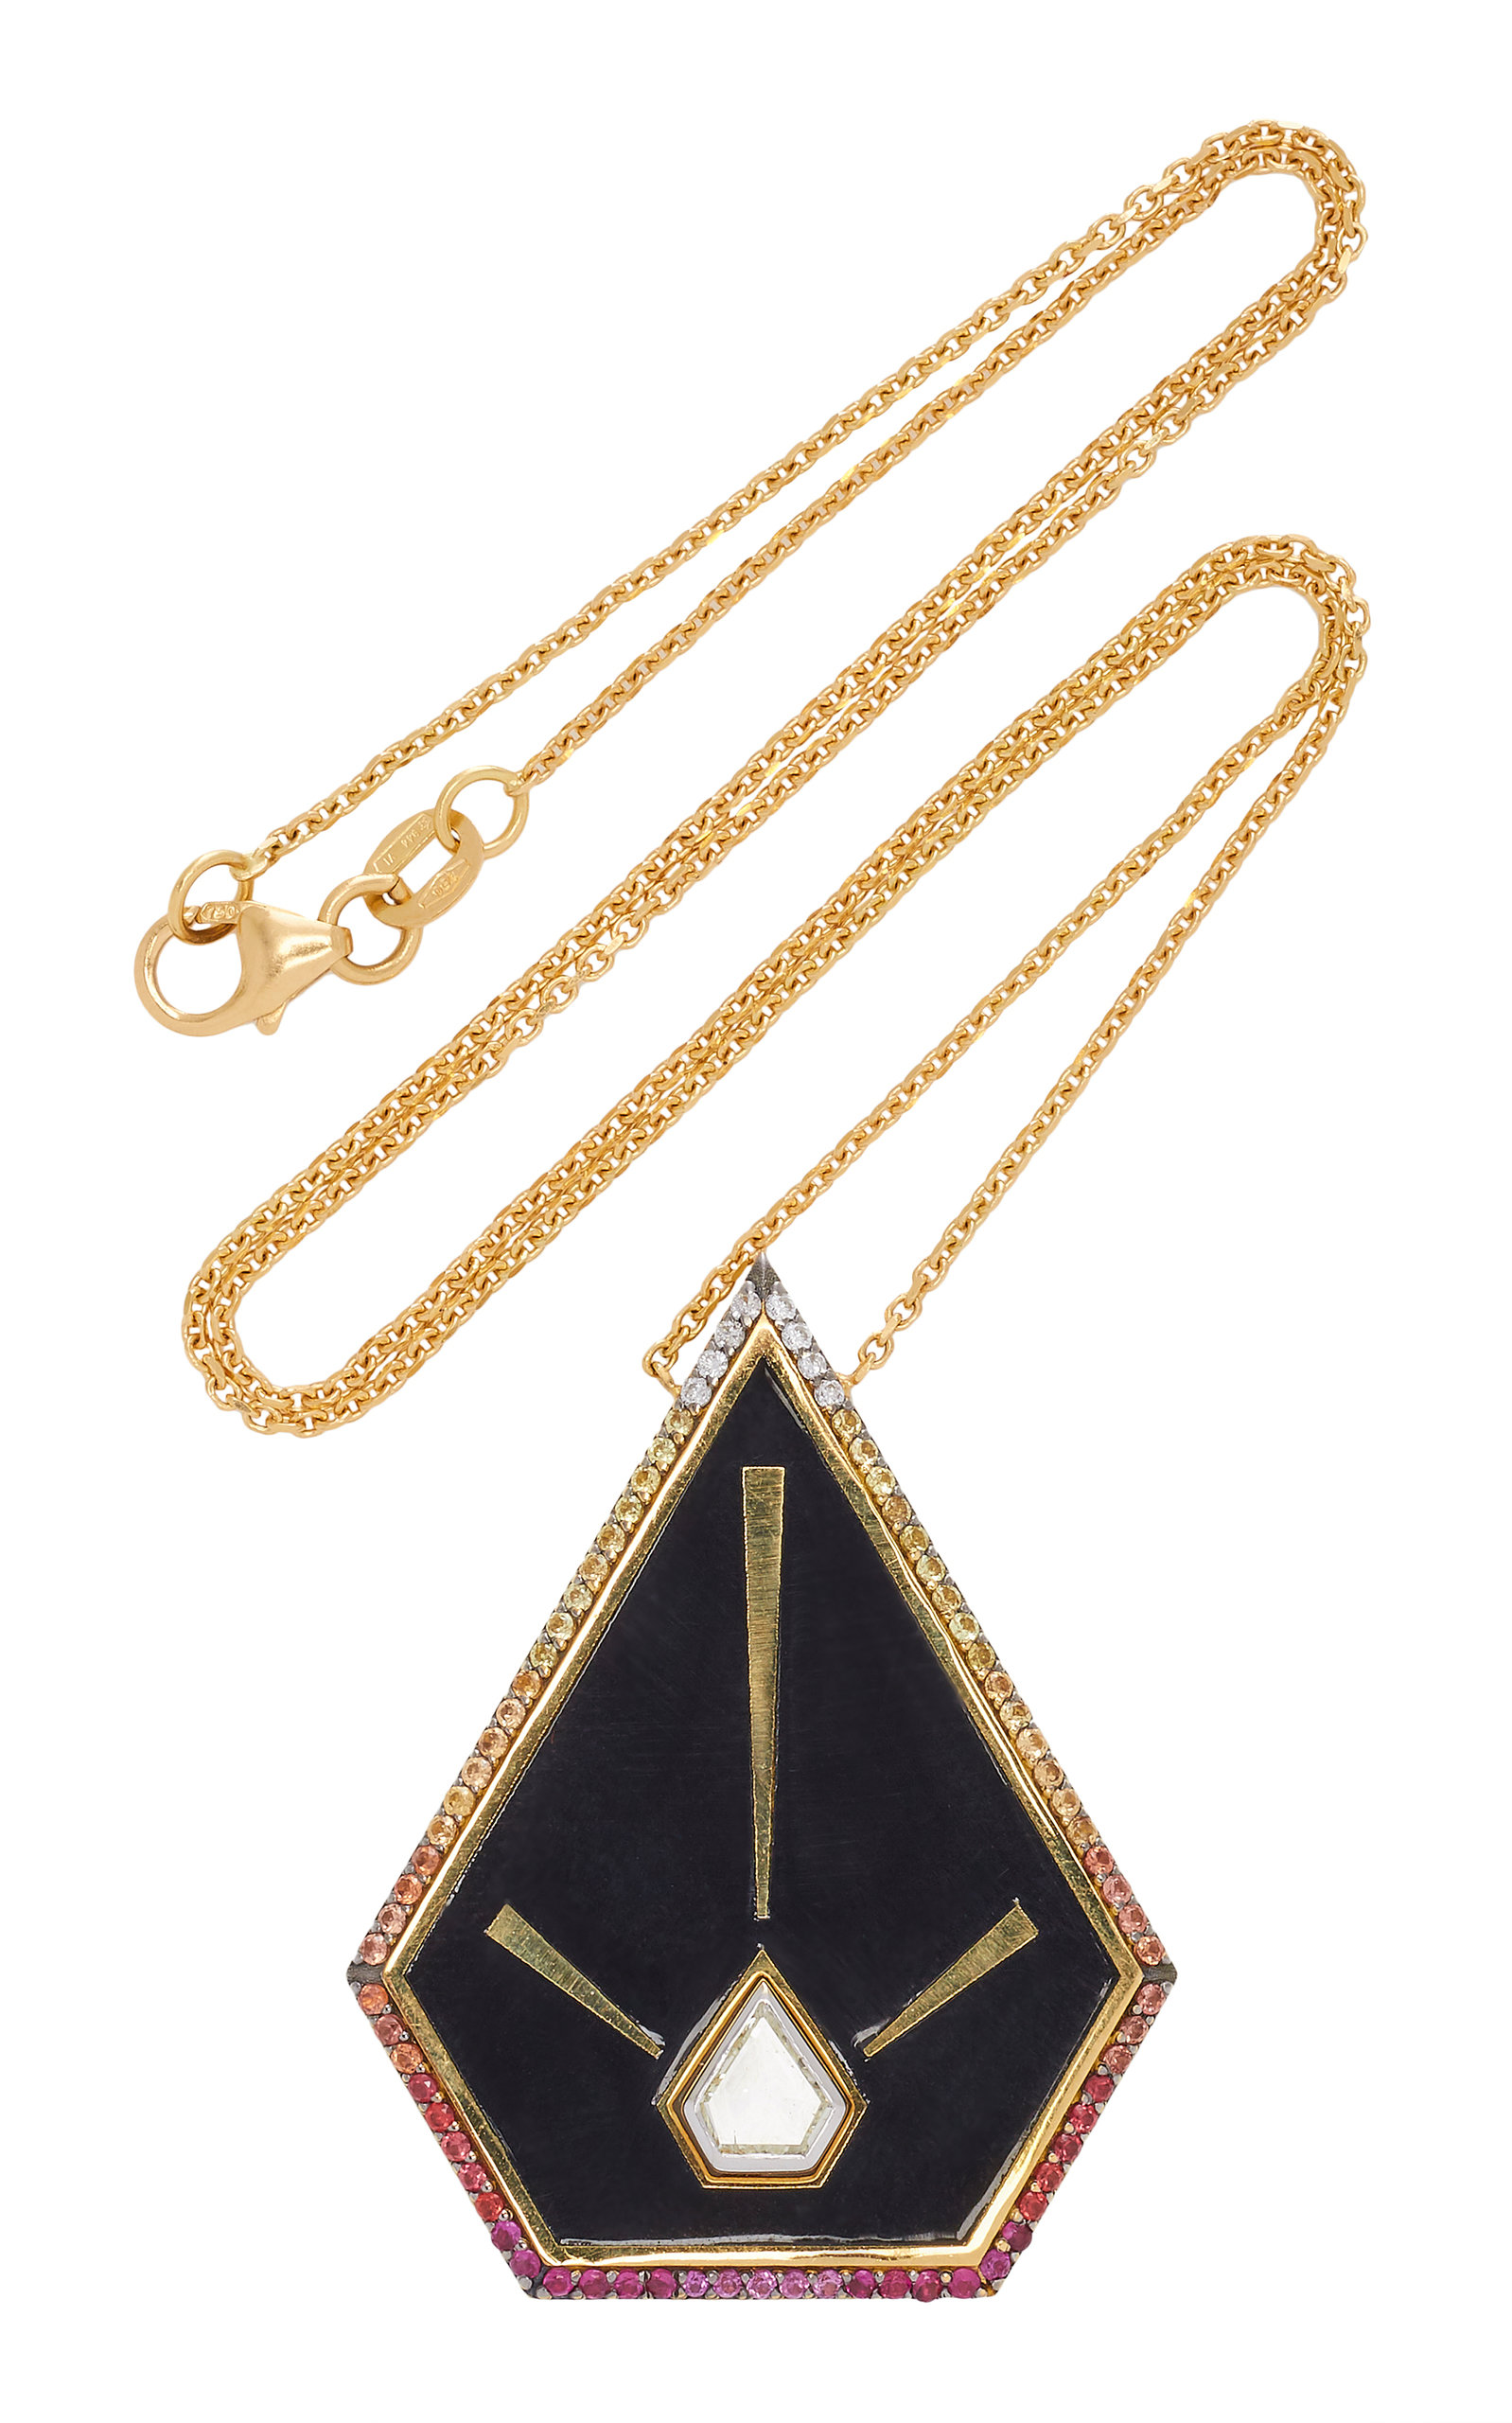 ELE KARELA One-Of-A-Kind Blaze Pyramid Pendant in Gold